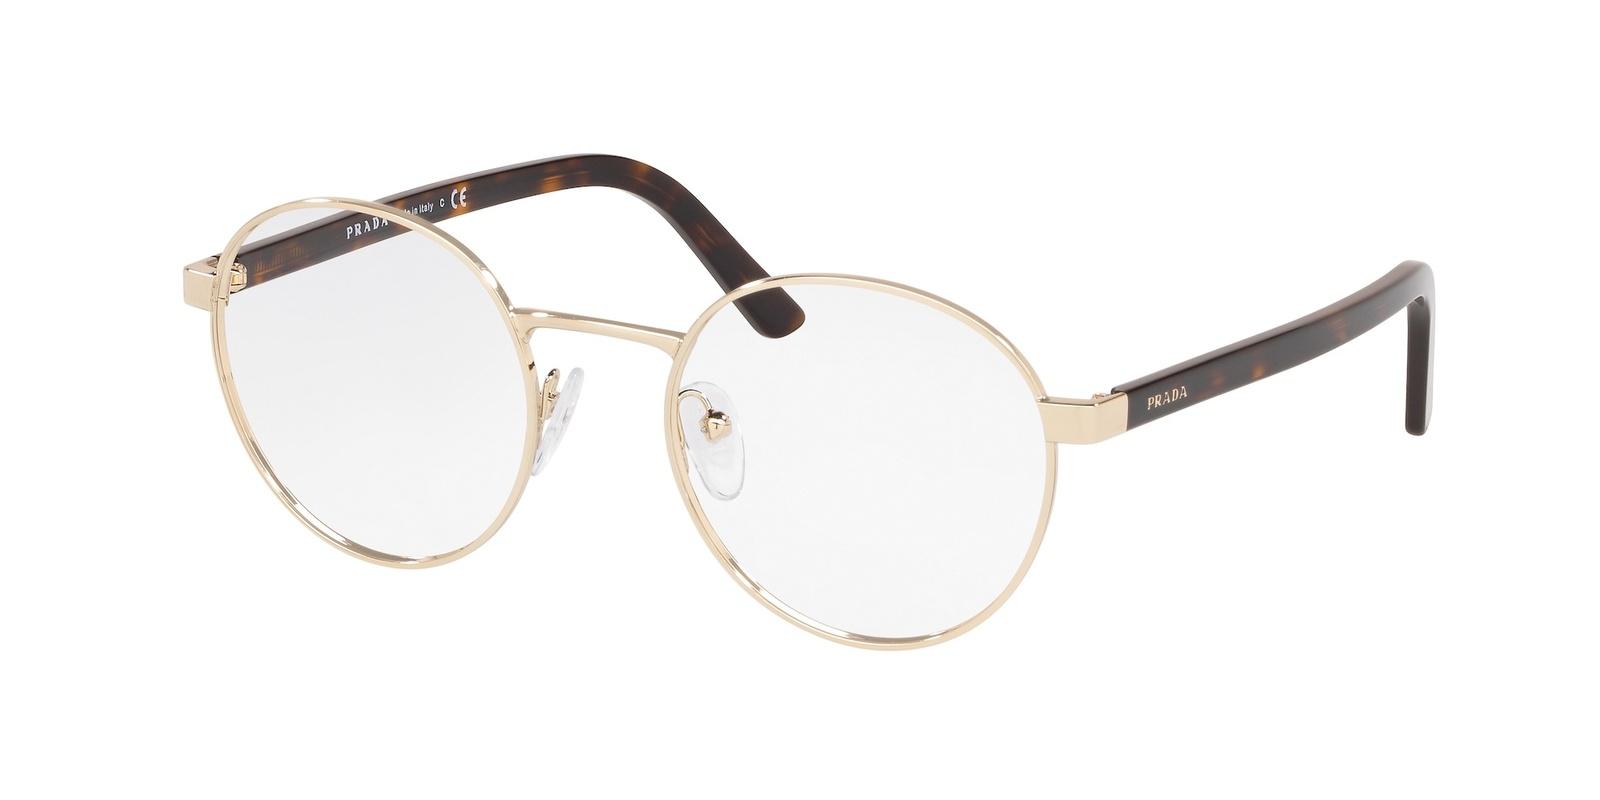 Prada PR 52XV HERITAGE eyeglasses